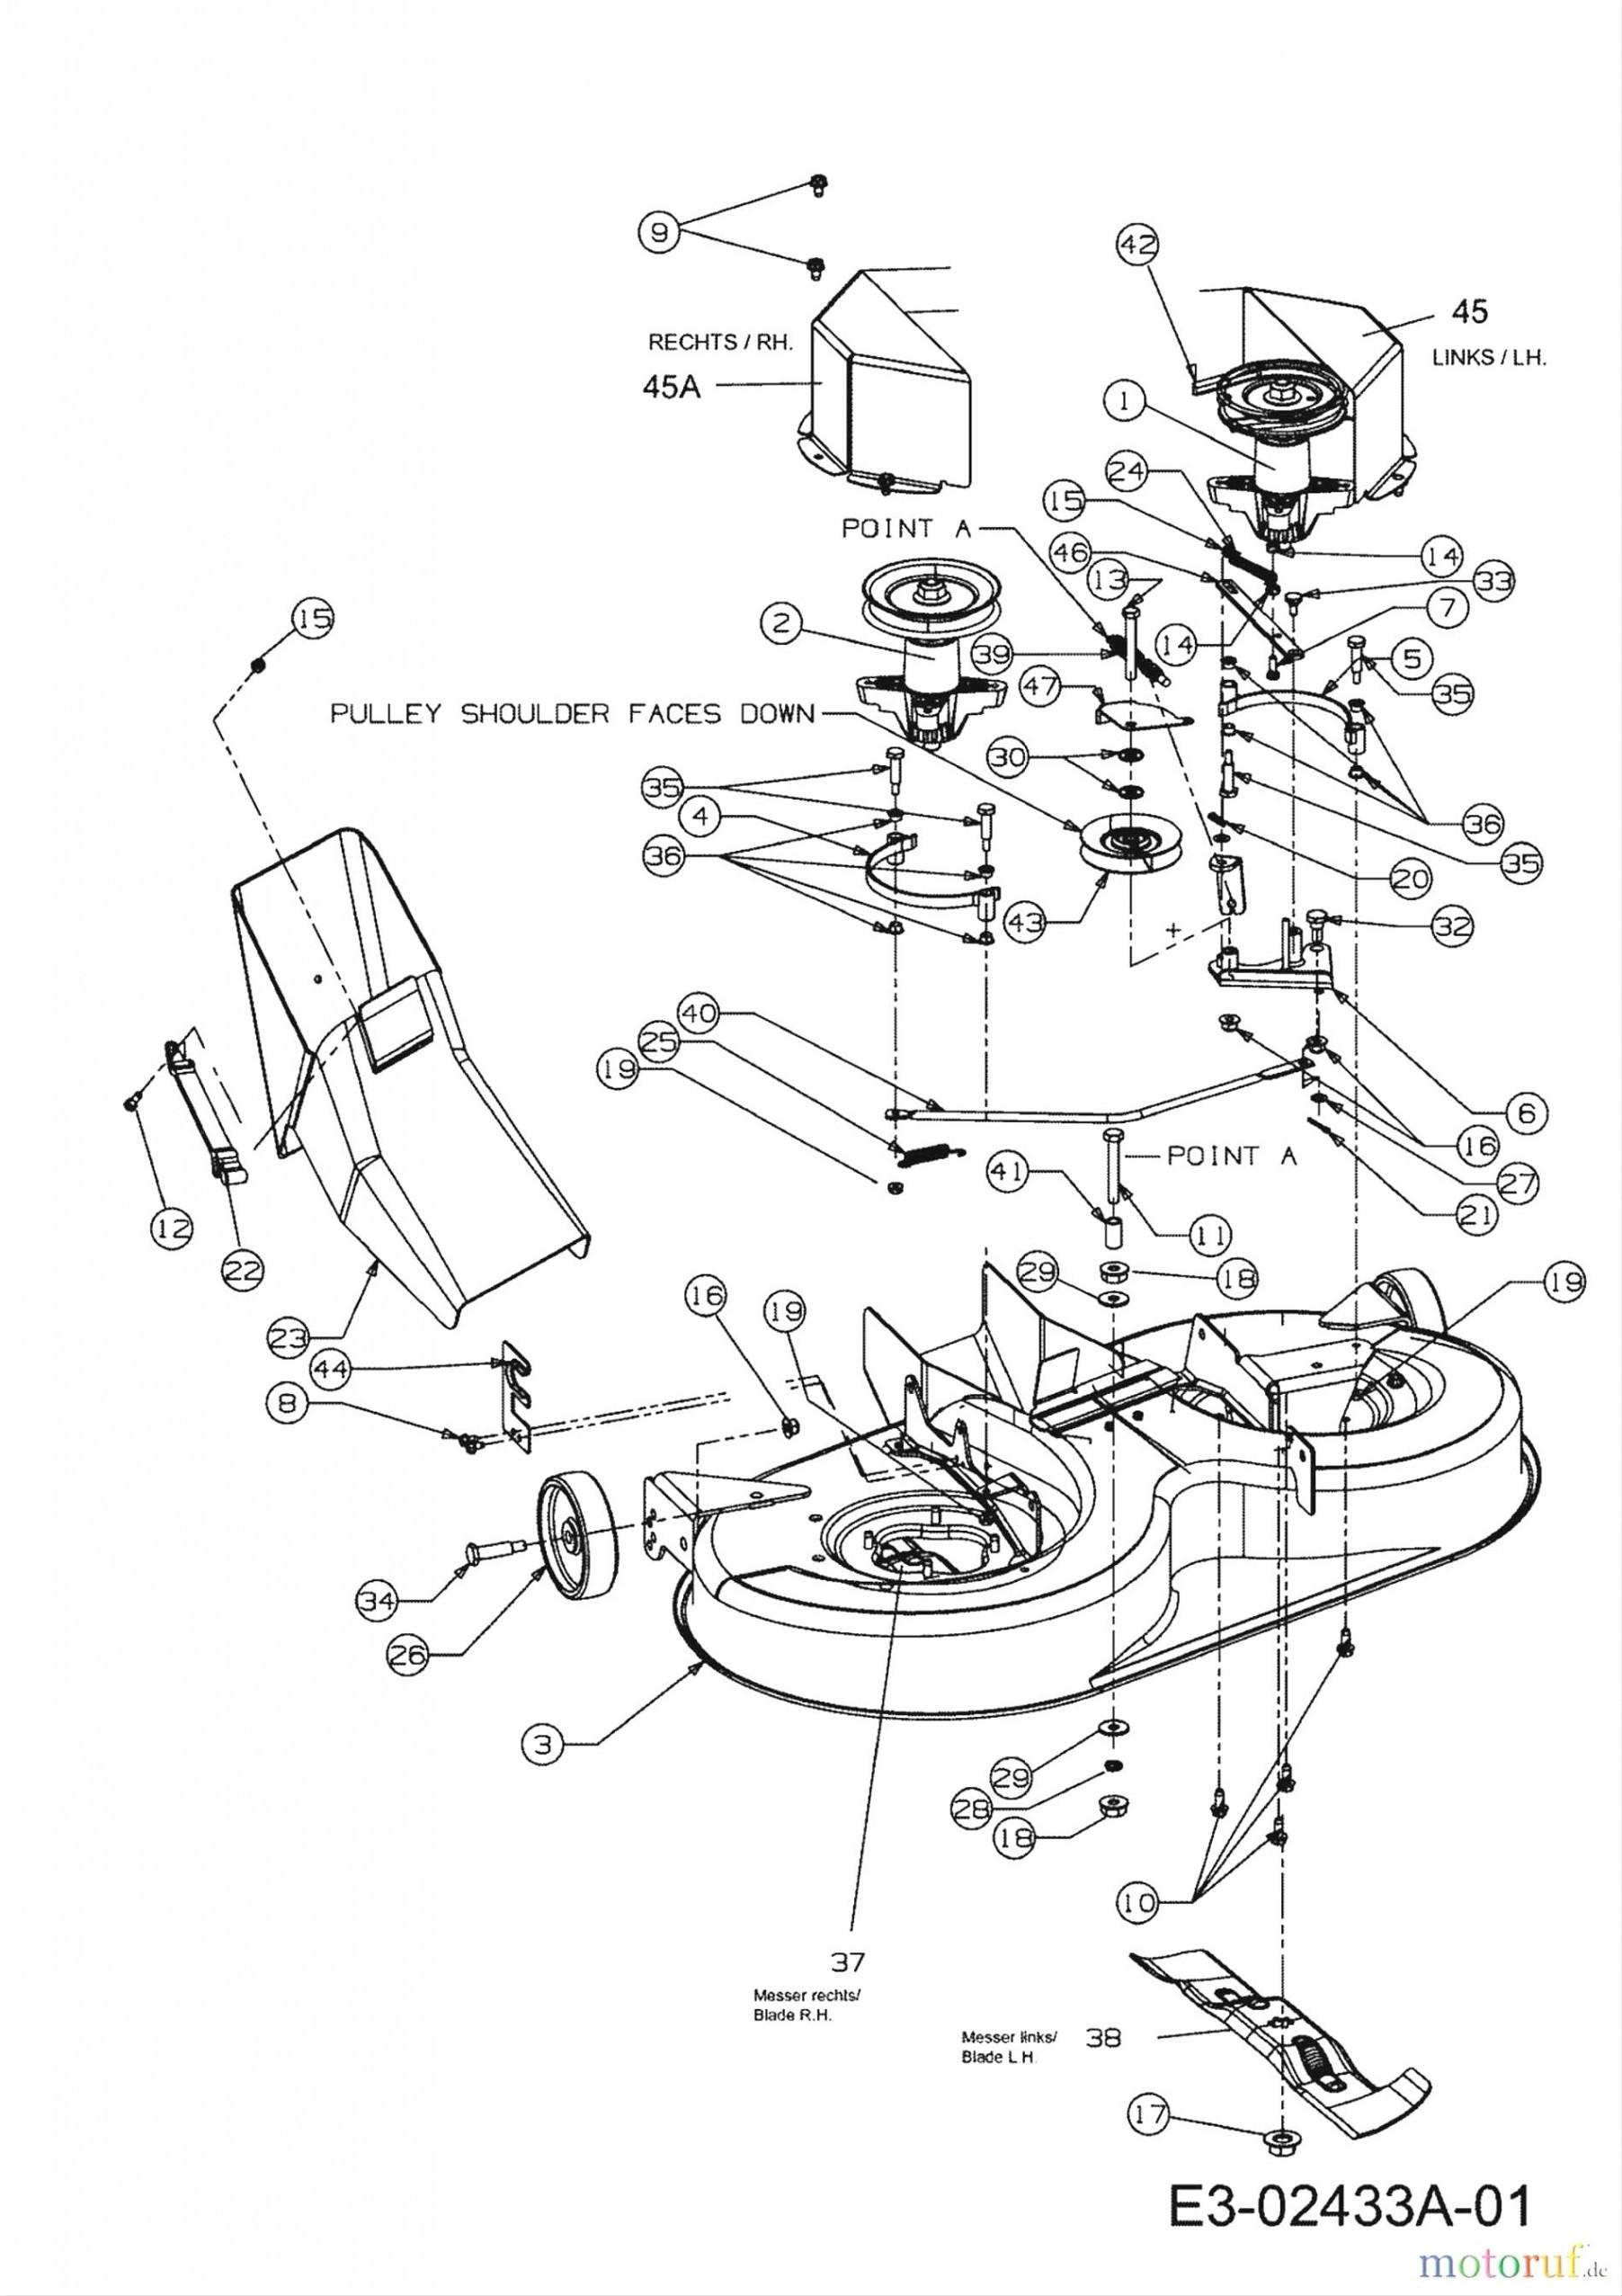 Honda 6 5 Hp Engine Parts Diagram 2 Honda Lawn Mower Parts Diagram Of Honda 6 5 Hp Engine Parts Diagram 2